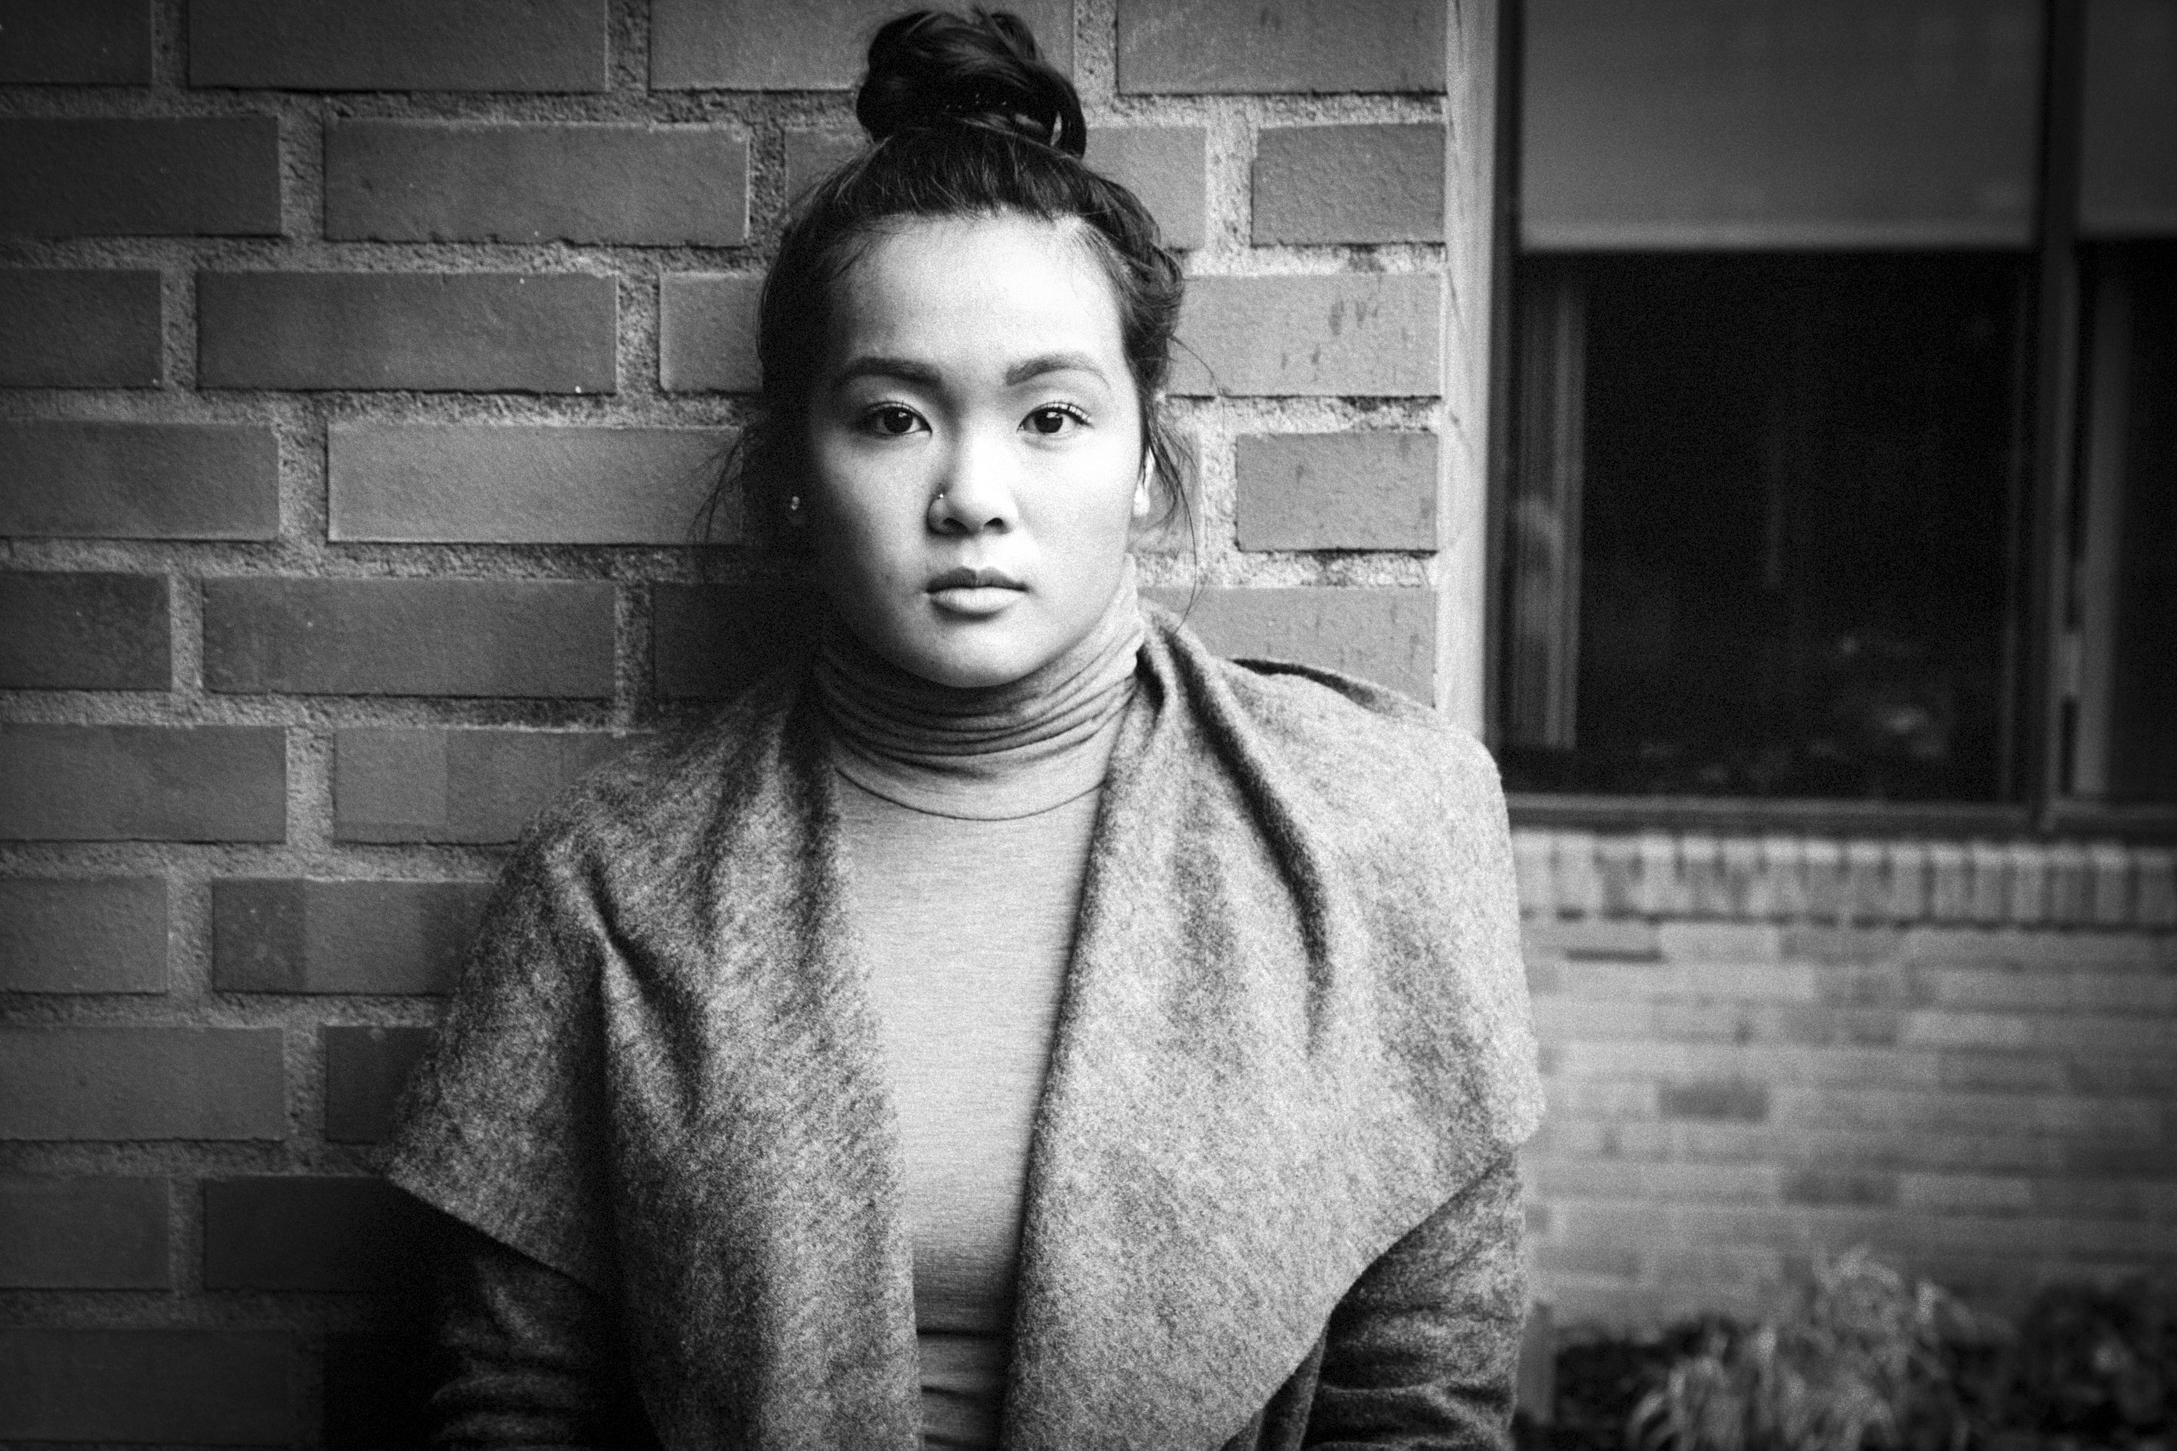 Katty Kaunang, Our Communities, Our Stories: UO Diversity